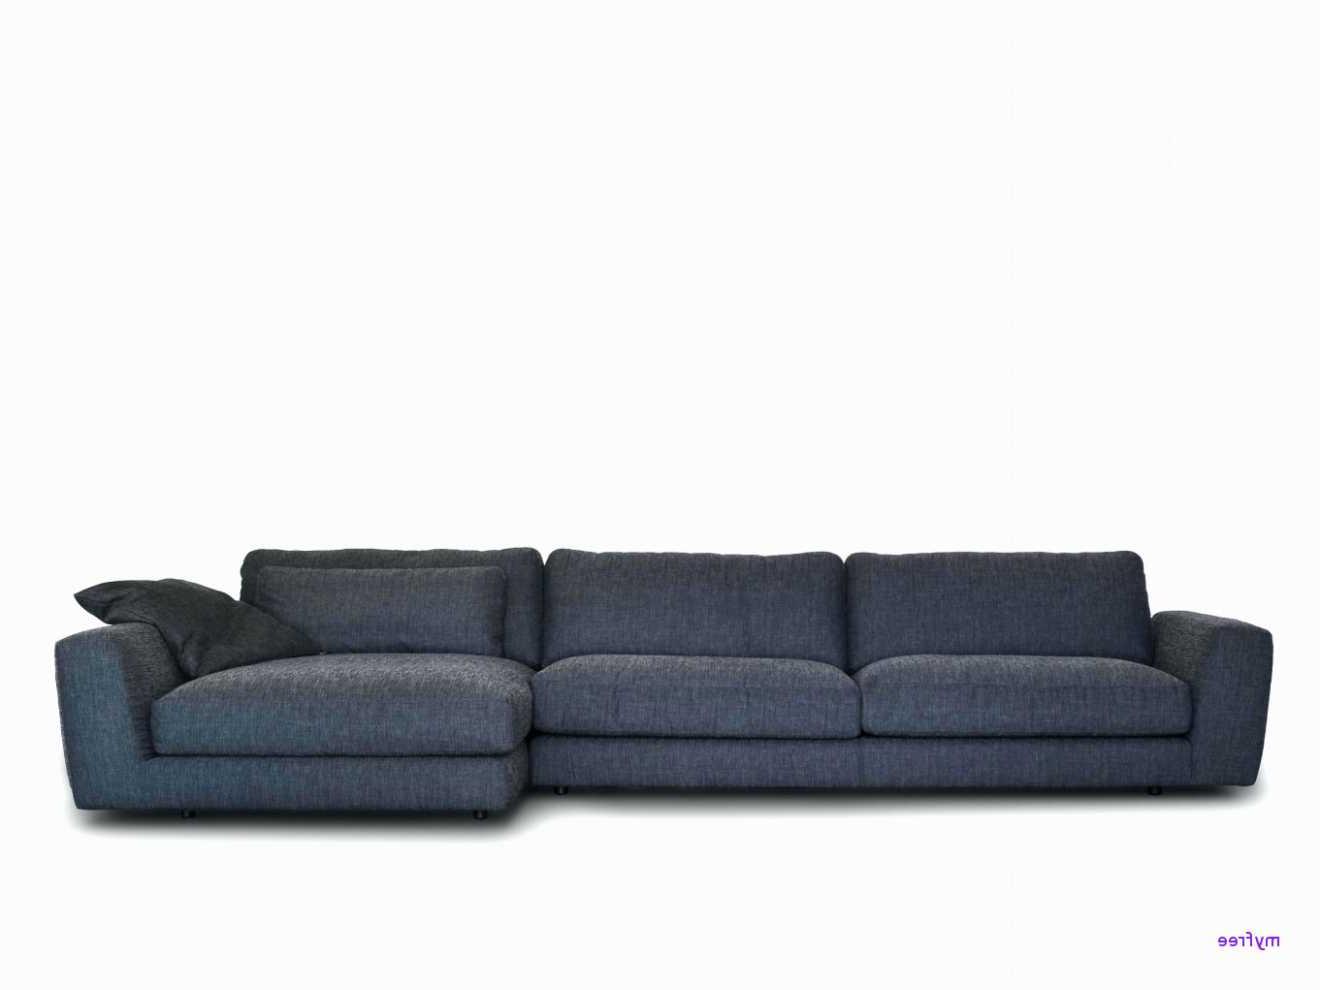 Sofa Chaise Longue Barato Nkde sofas Chaise Longue Baratos Encantadora Chaise Longue Lucia